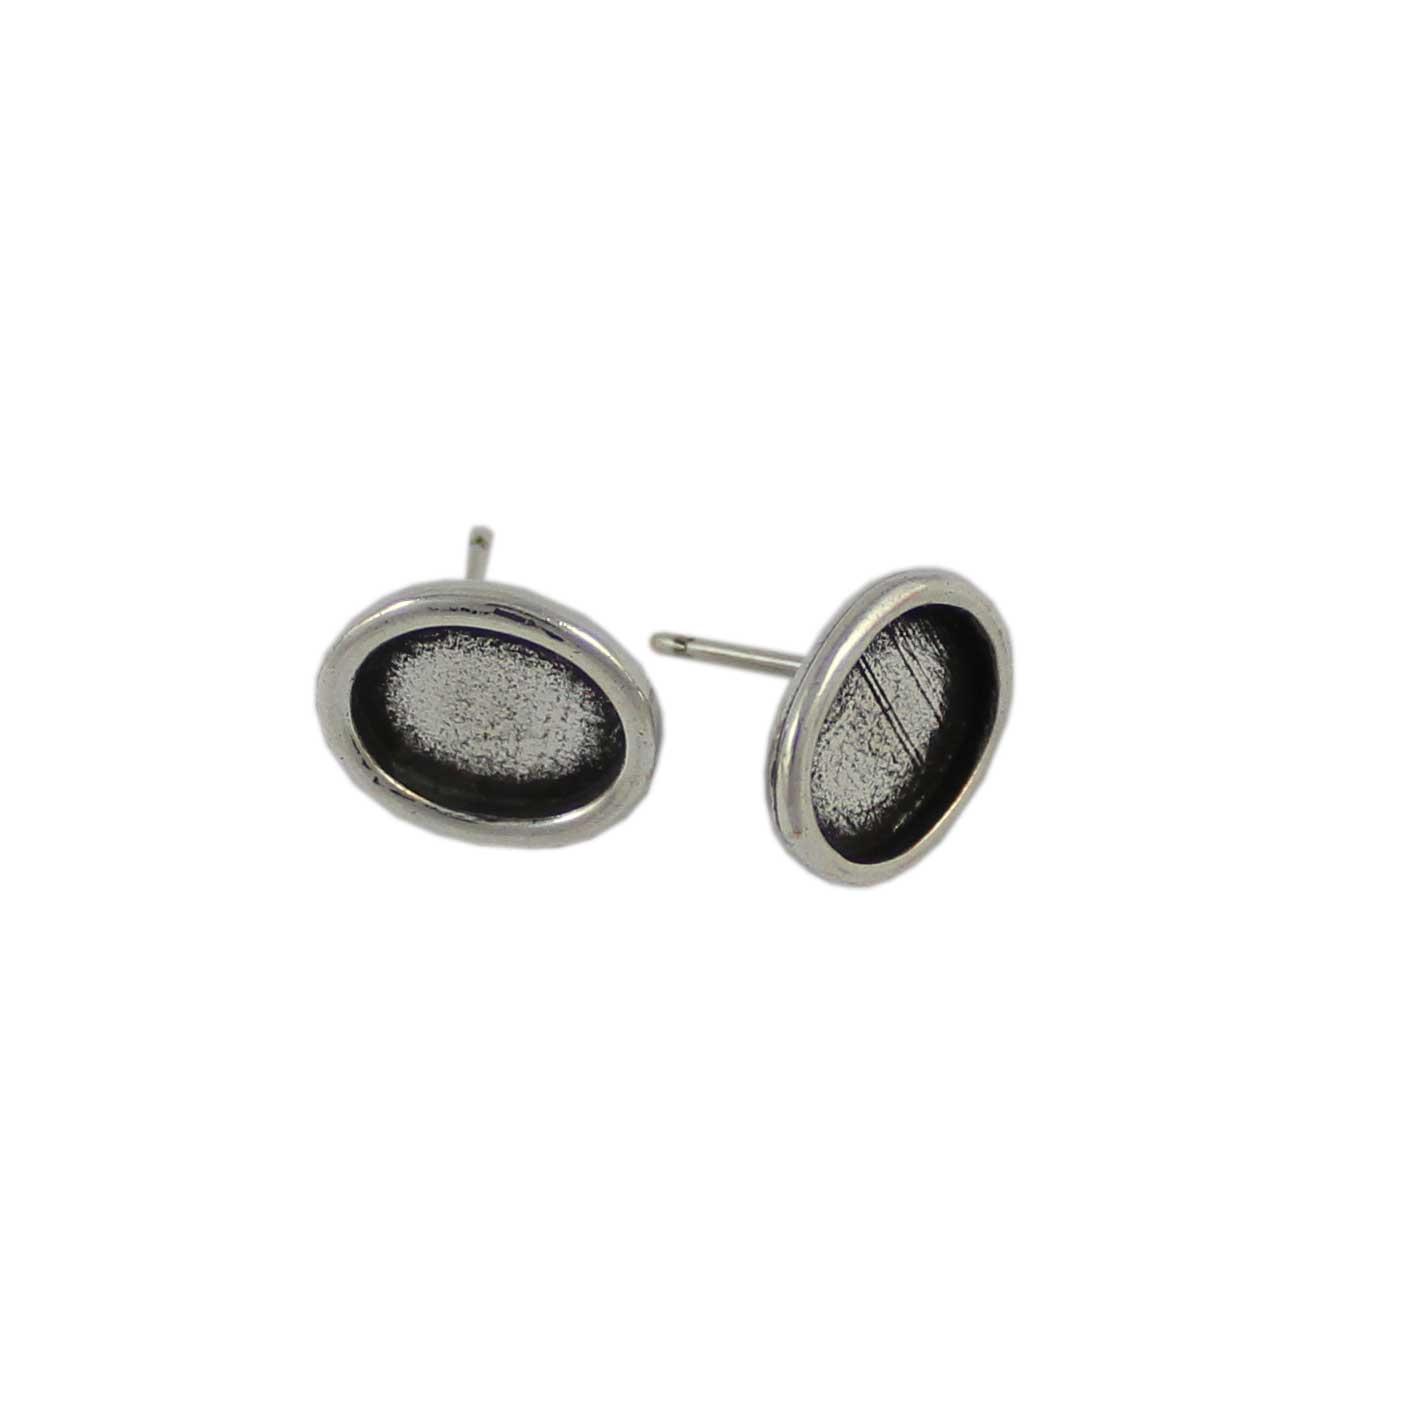 Base pendiente redondo para cristal de 7mm - Bolsa de 30 unidades